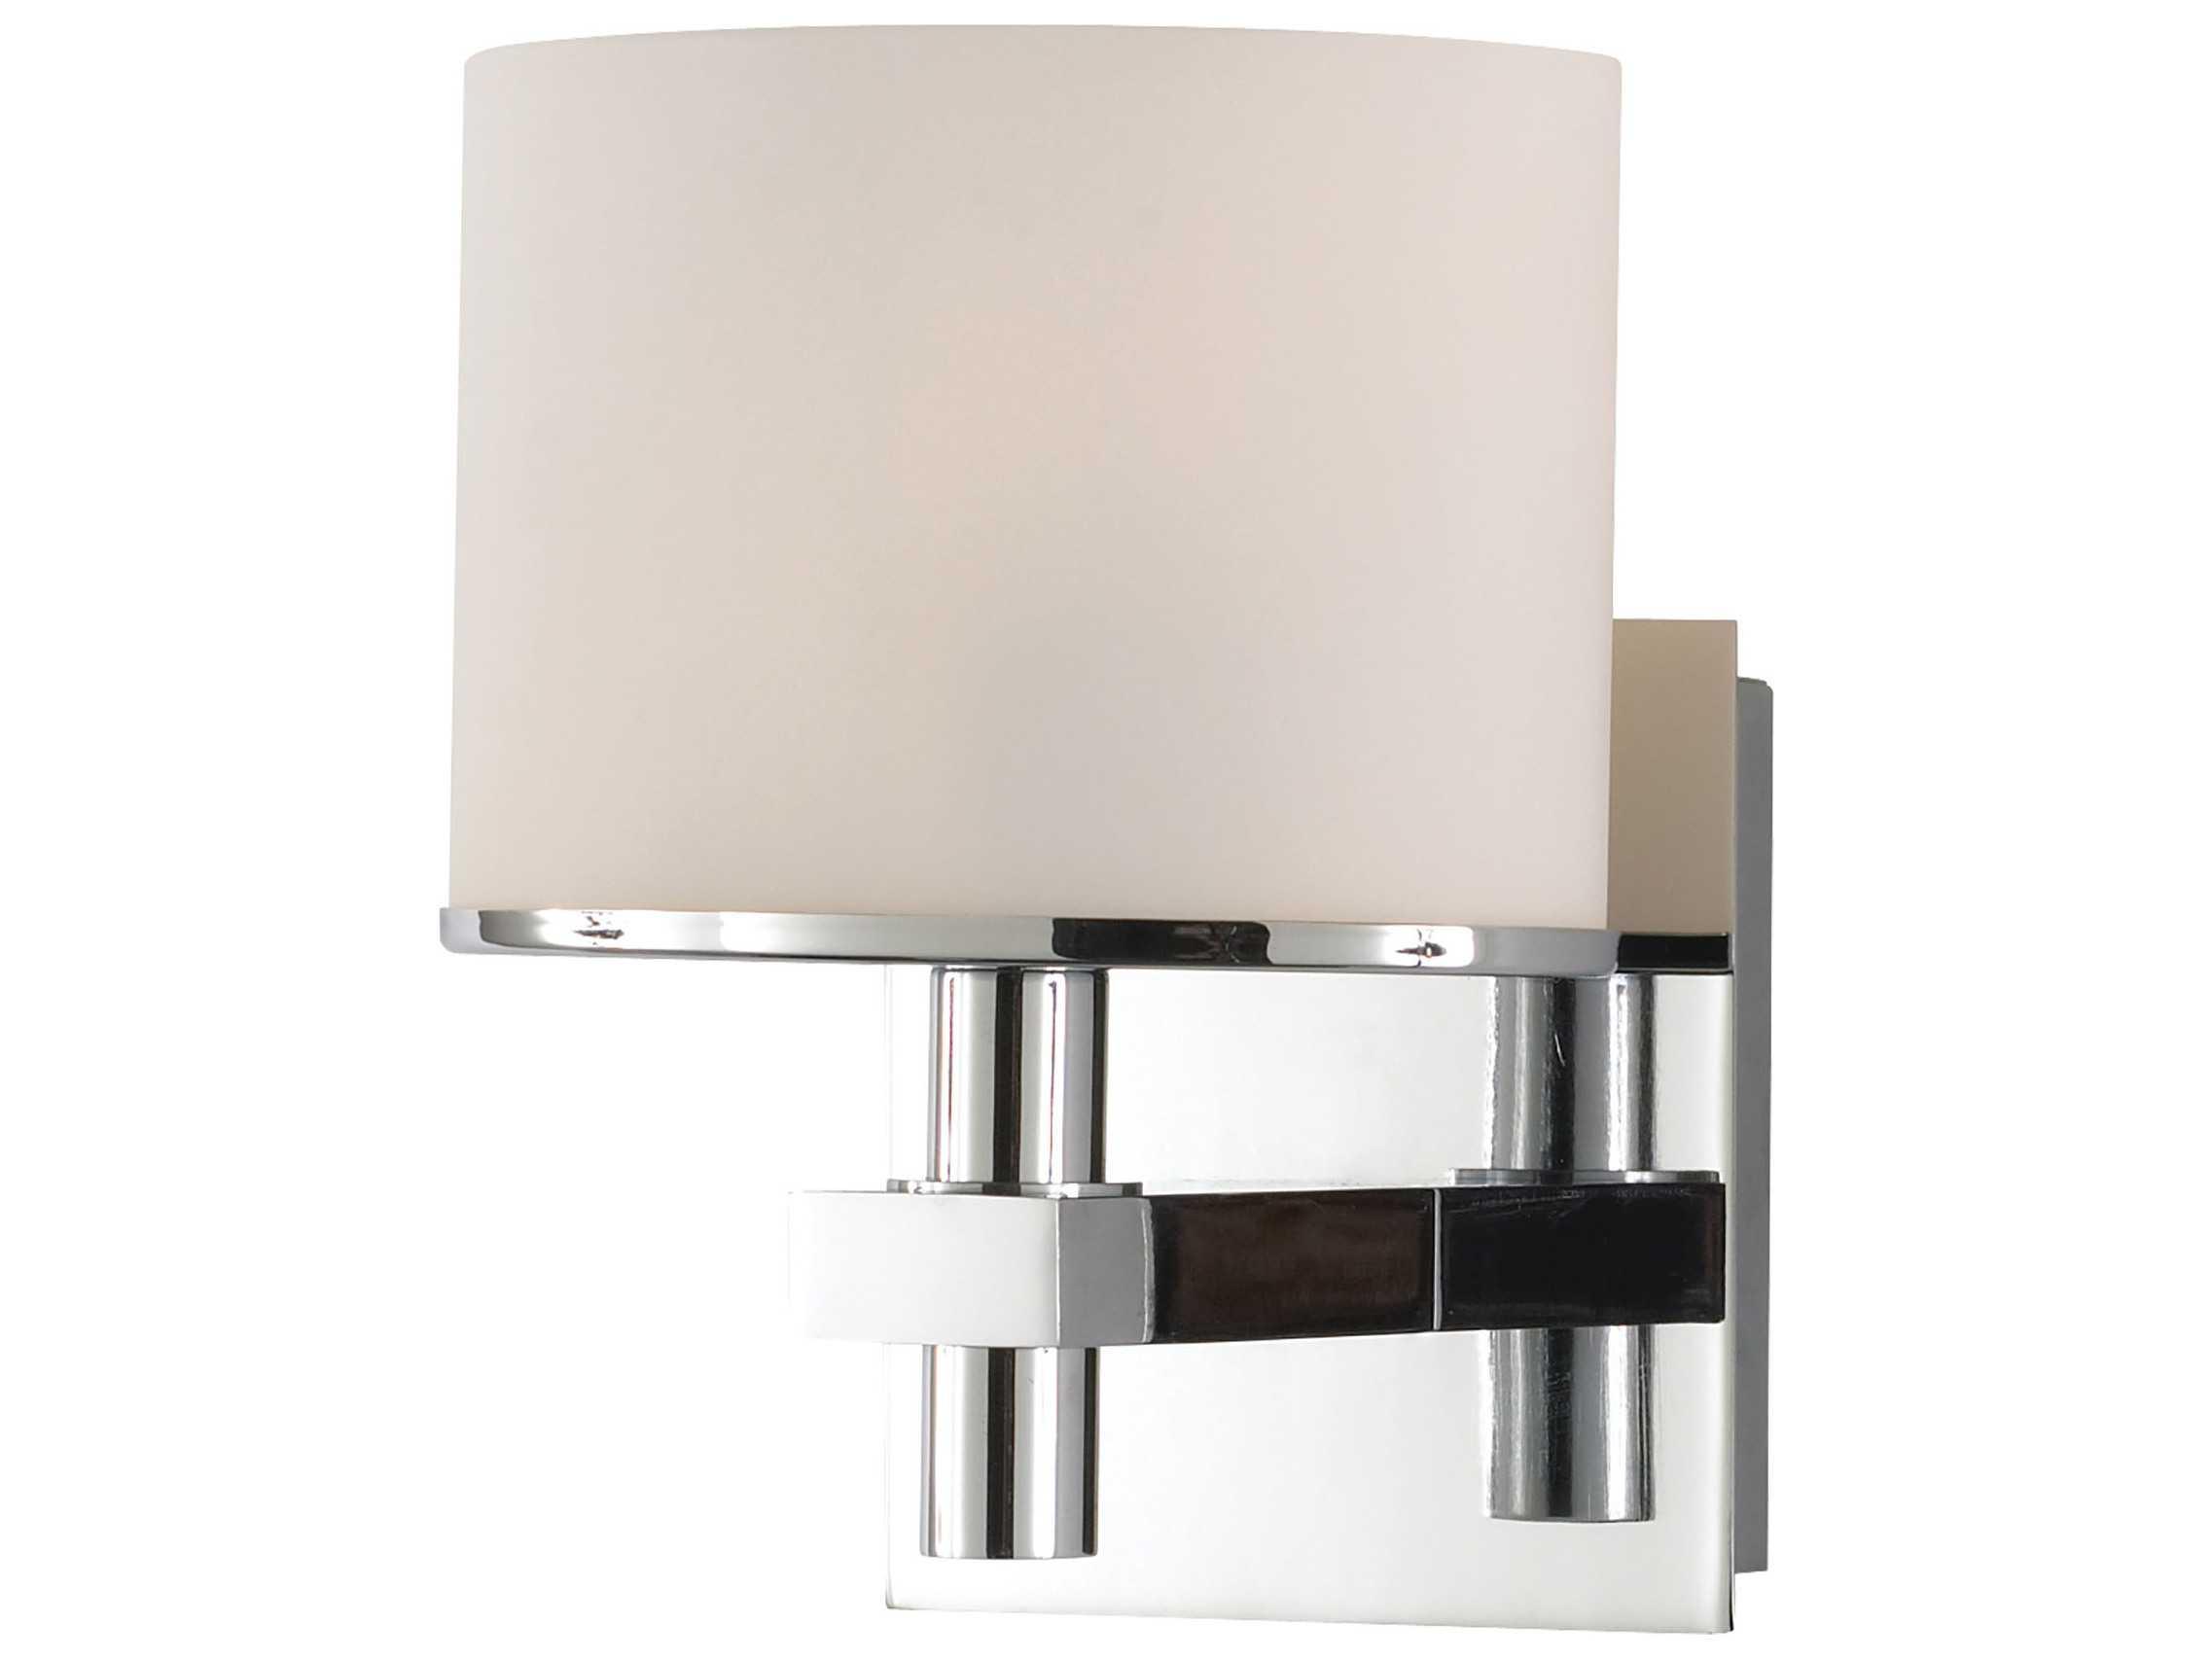 Vanity Light Temperature : Alico Ombra White Opal Glass Vanity Light ALCBV5111015